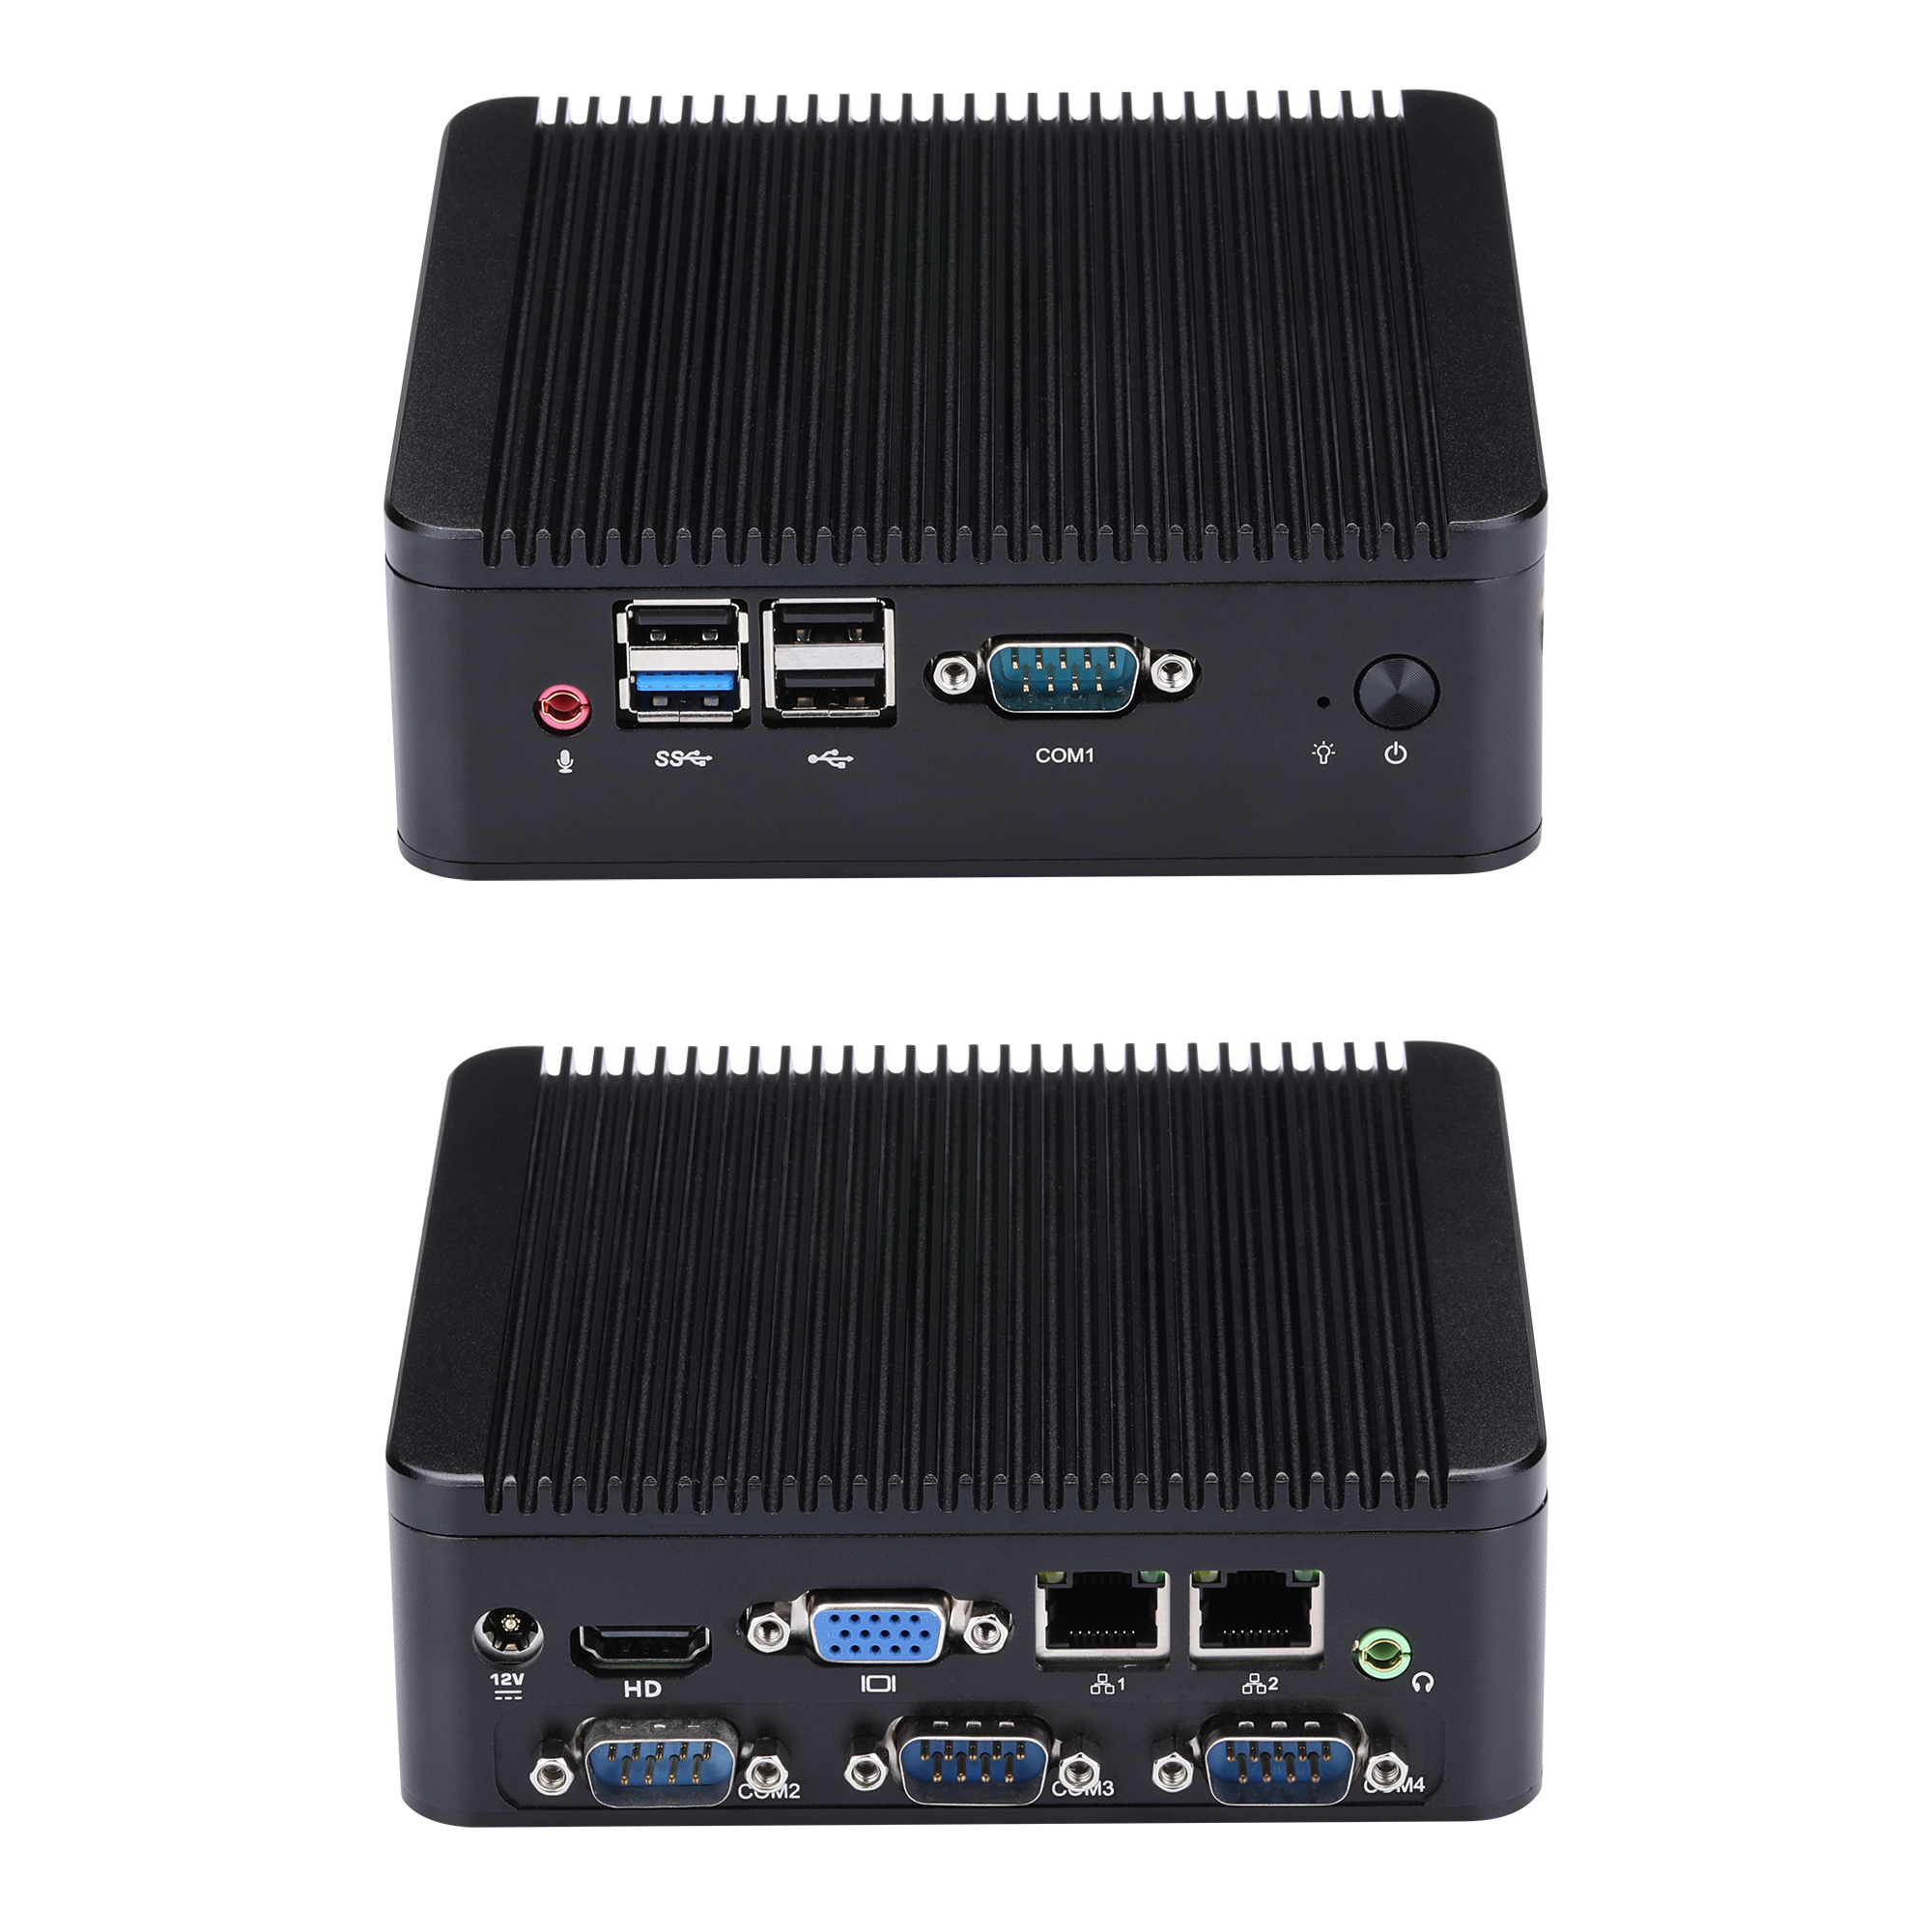 FAST 4 RS232 MINI PC J1800 J1900 Mini Living Room PC / HTPC Host / Industrial Computer Celeron Quad-Core